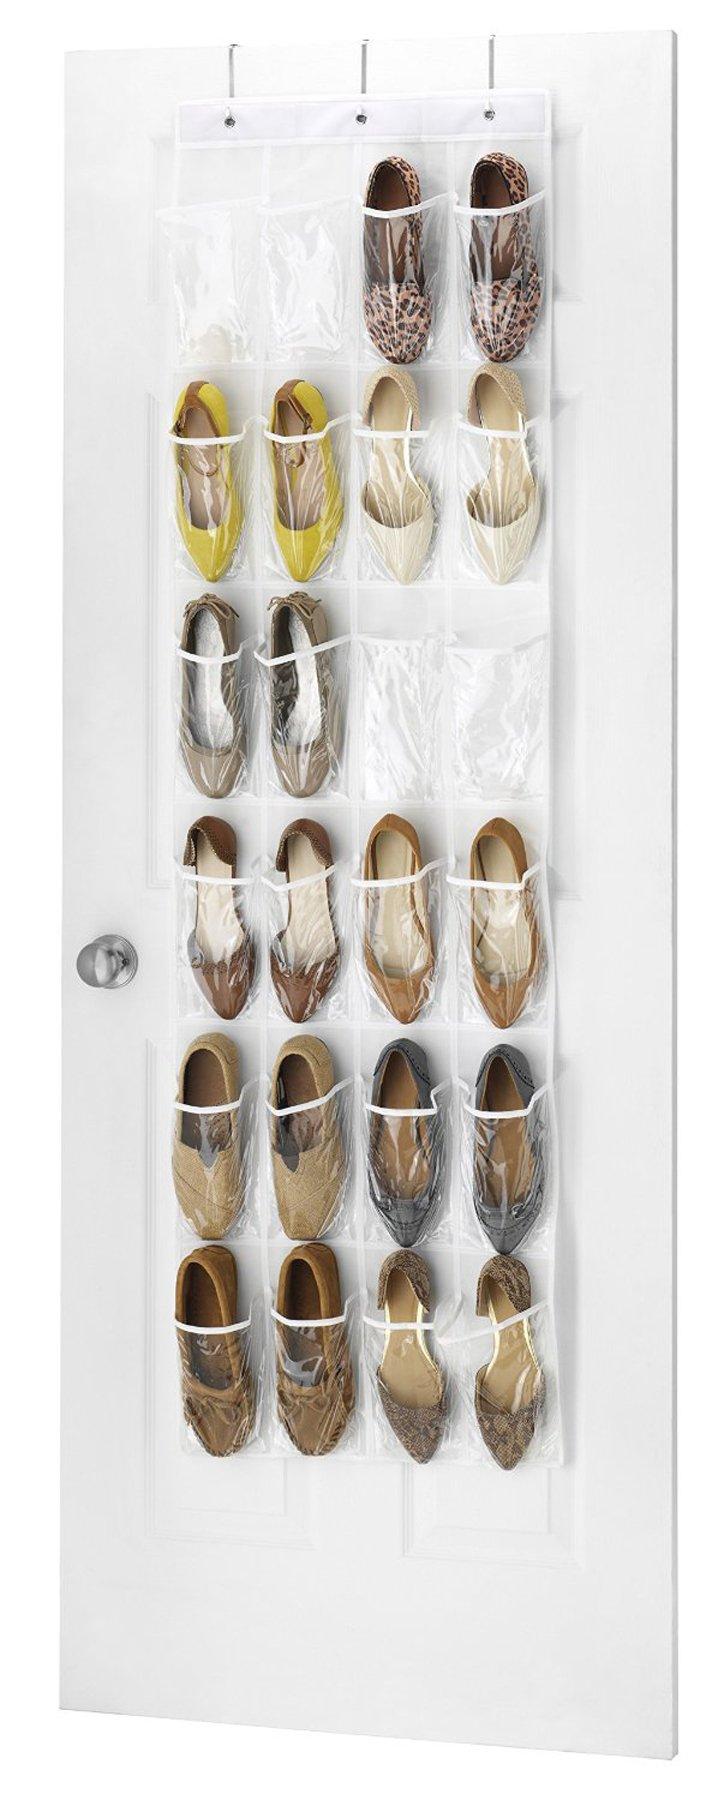 Small Lighting Mirrored Sliding Wardrobe Doors Additional Options Fabulous  Result Product Gray Fabric Carpet